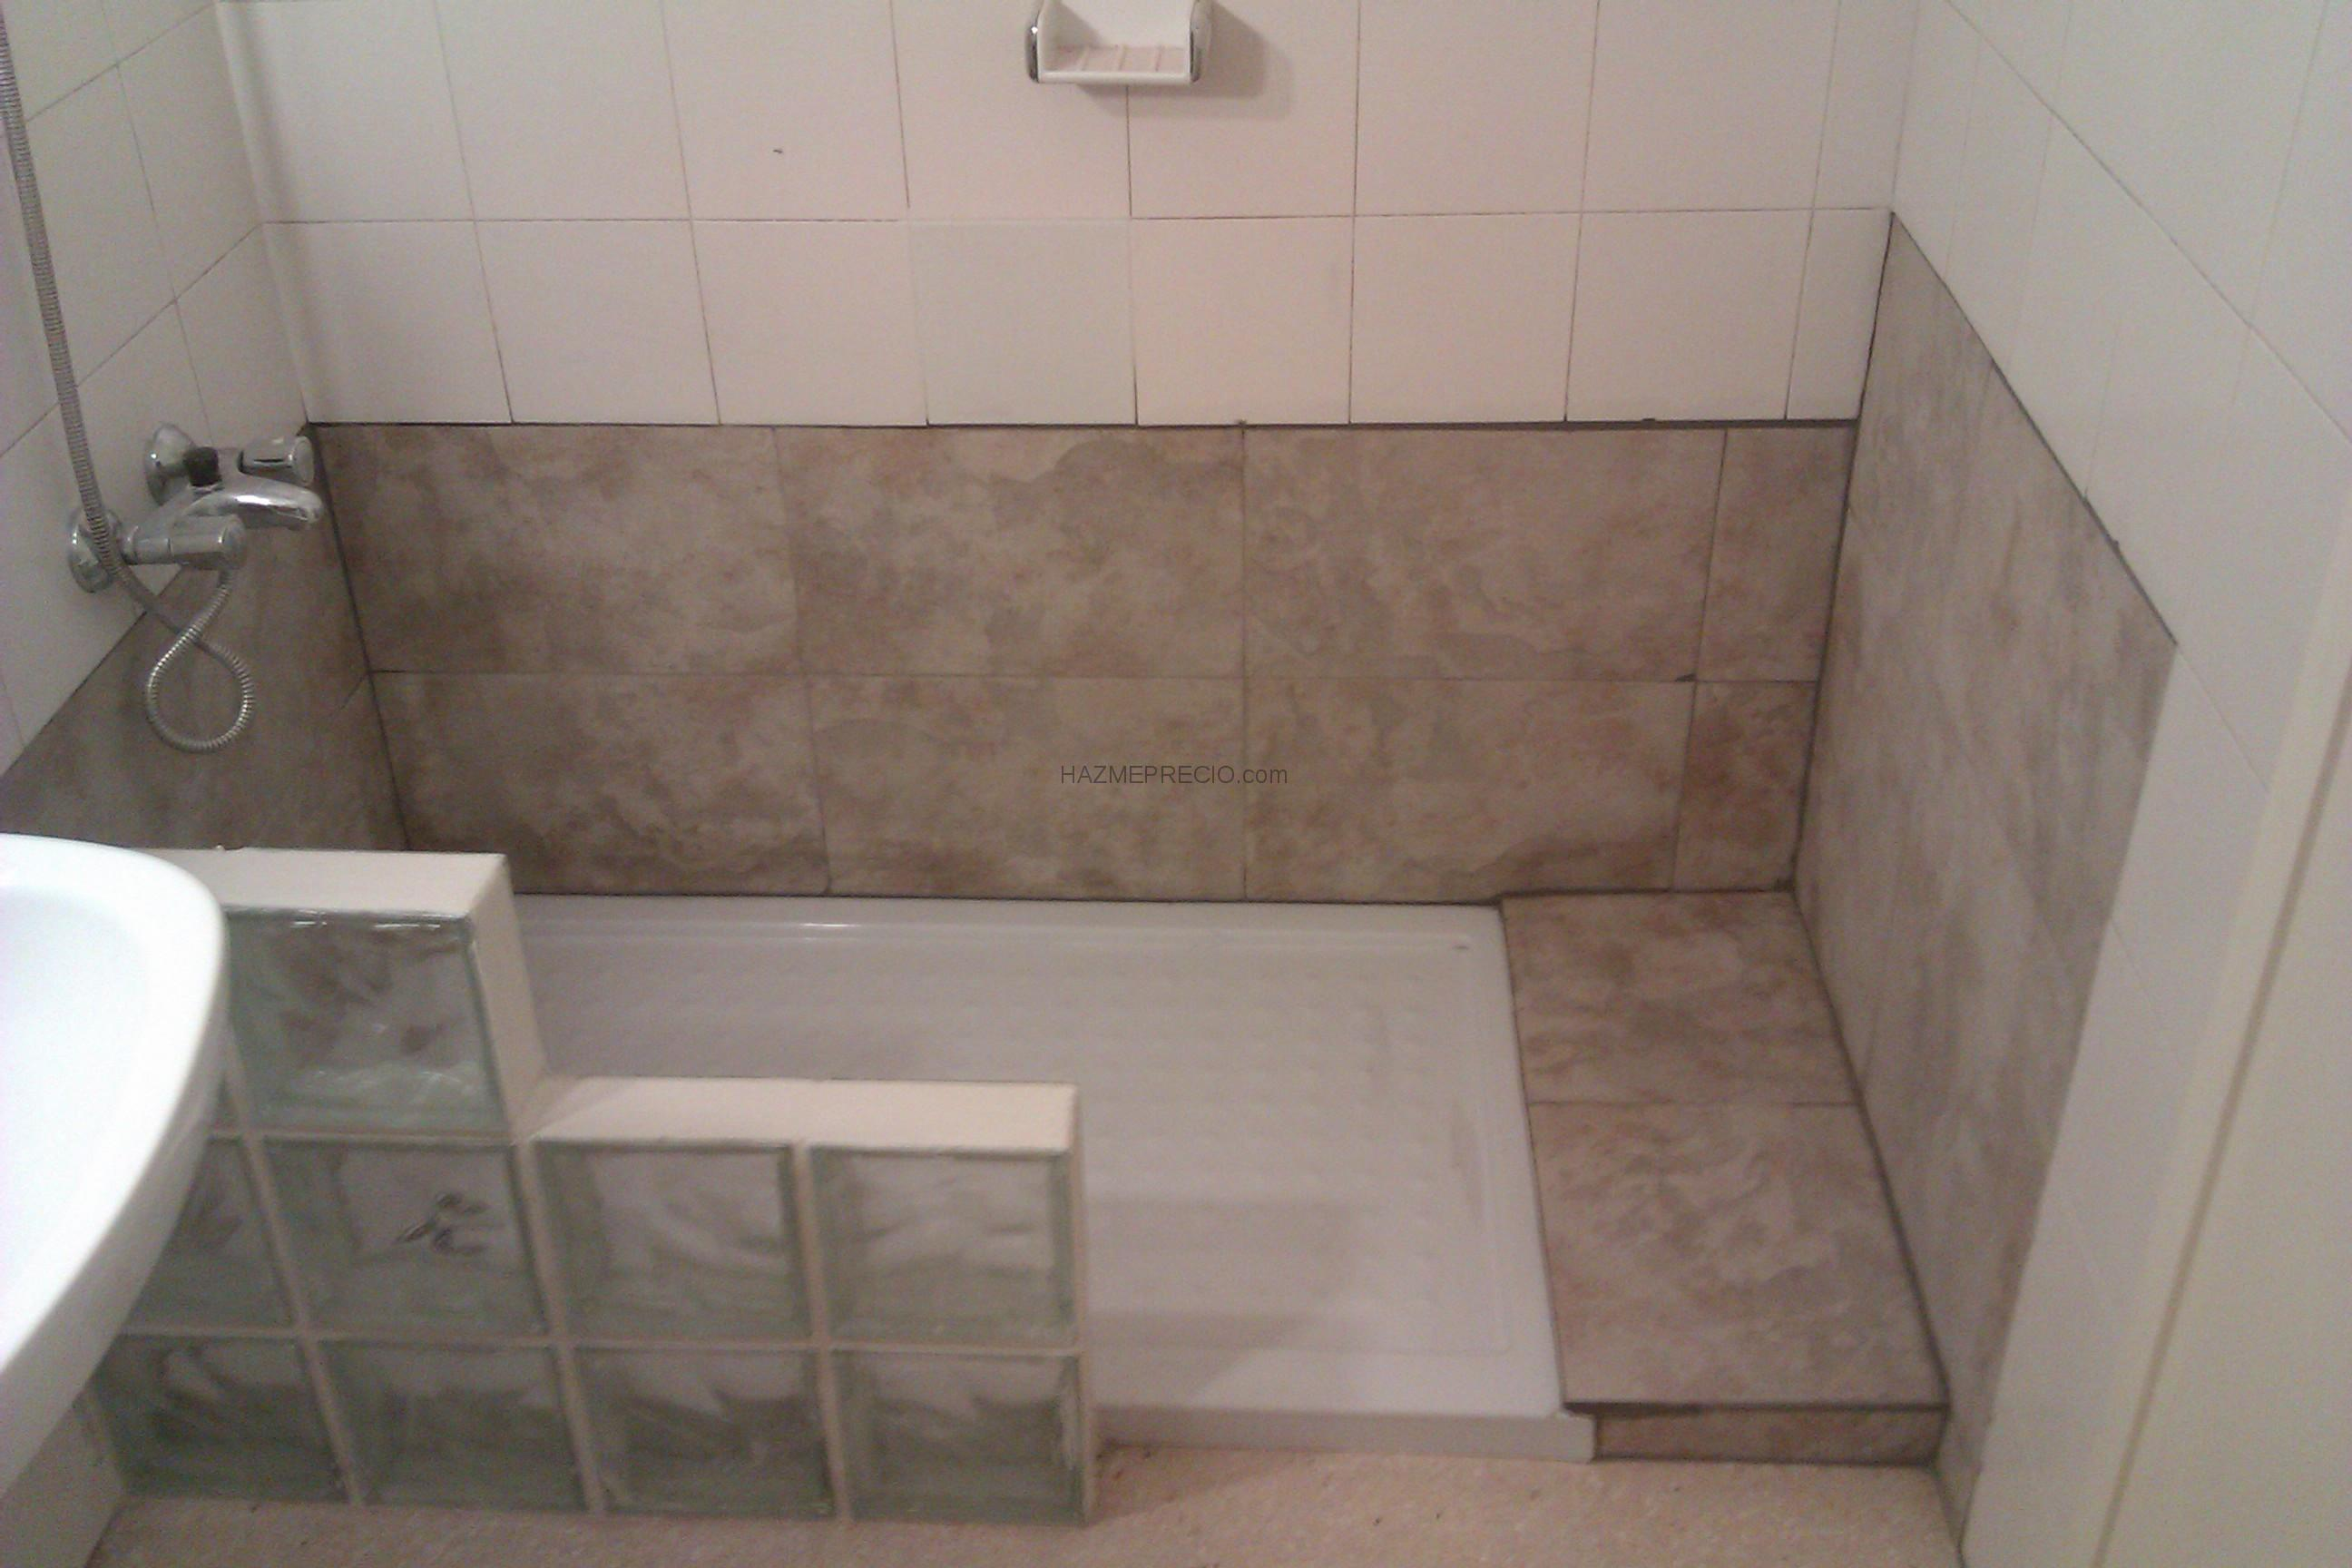 pumps tubos termo boiler impermeabilizar plato ducha On impermeabilizar plato ducha